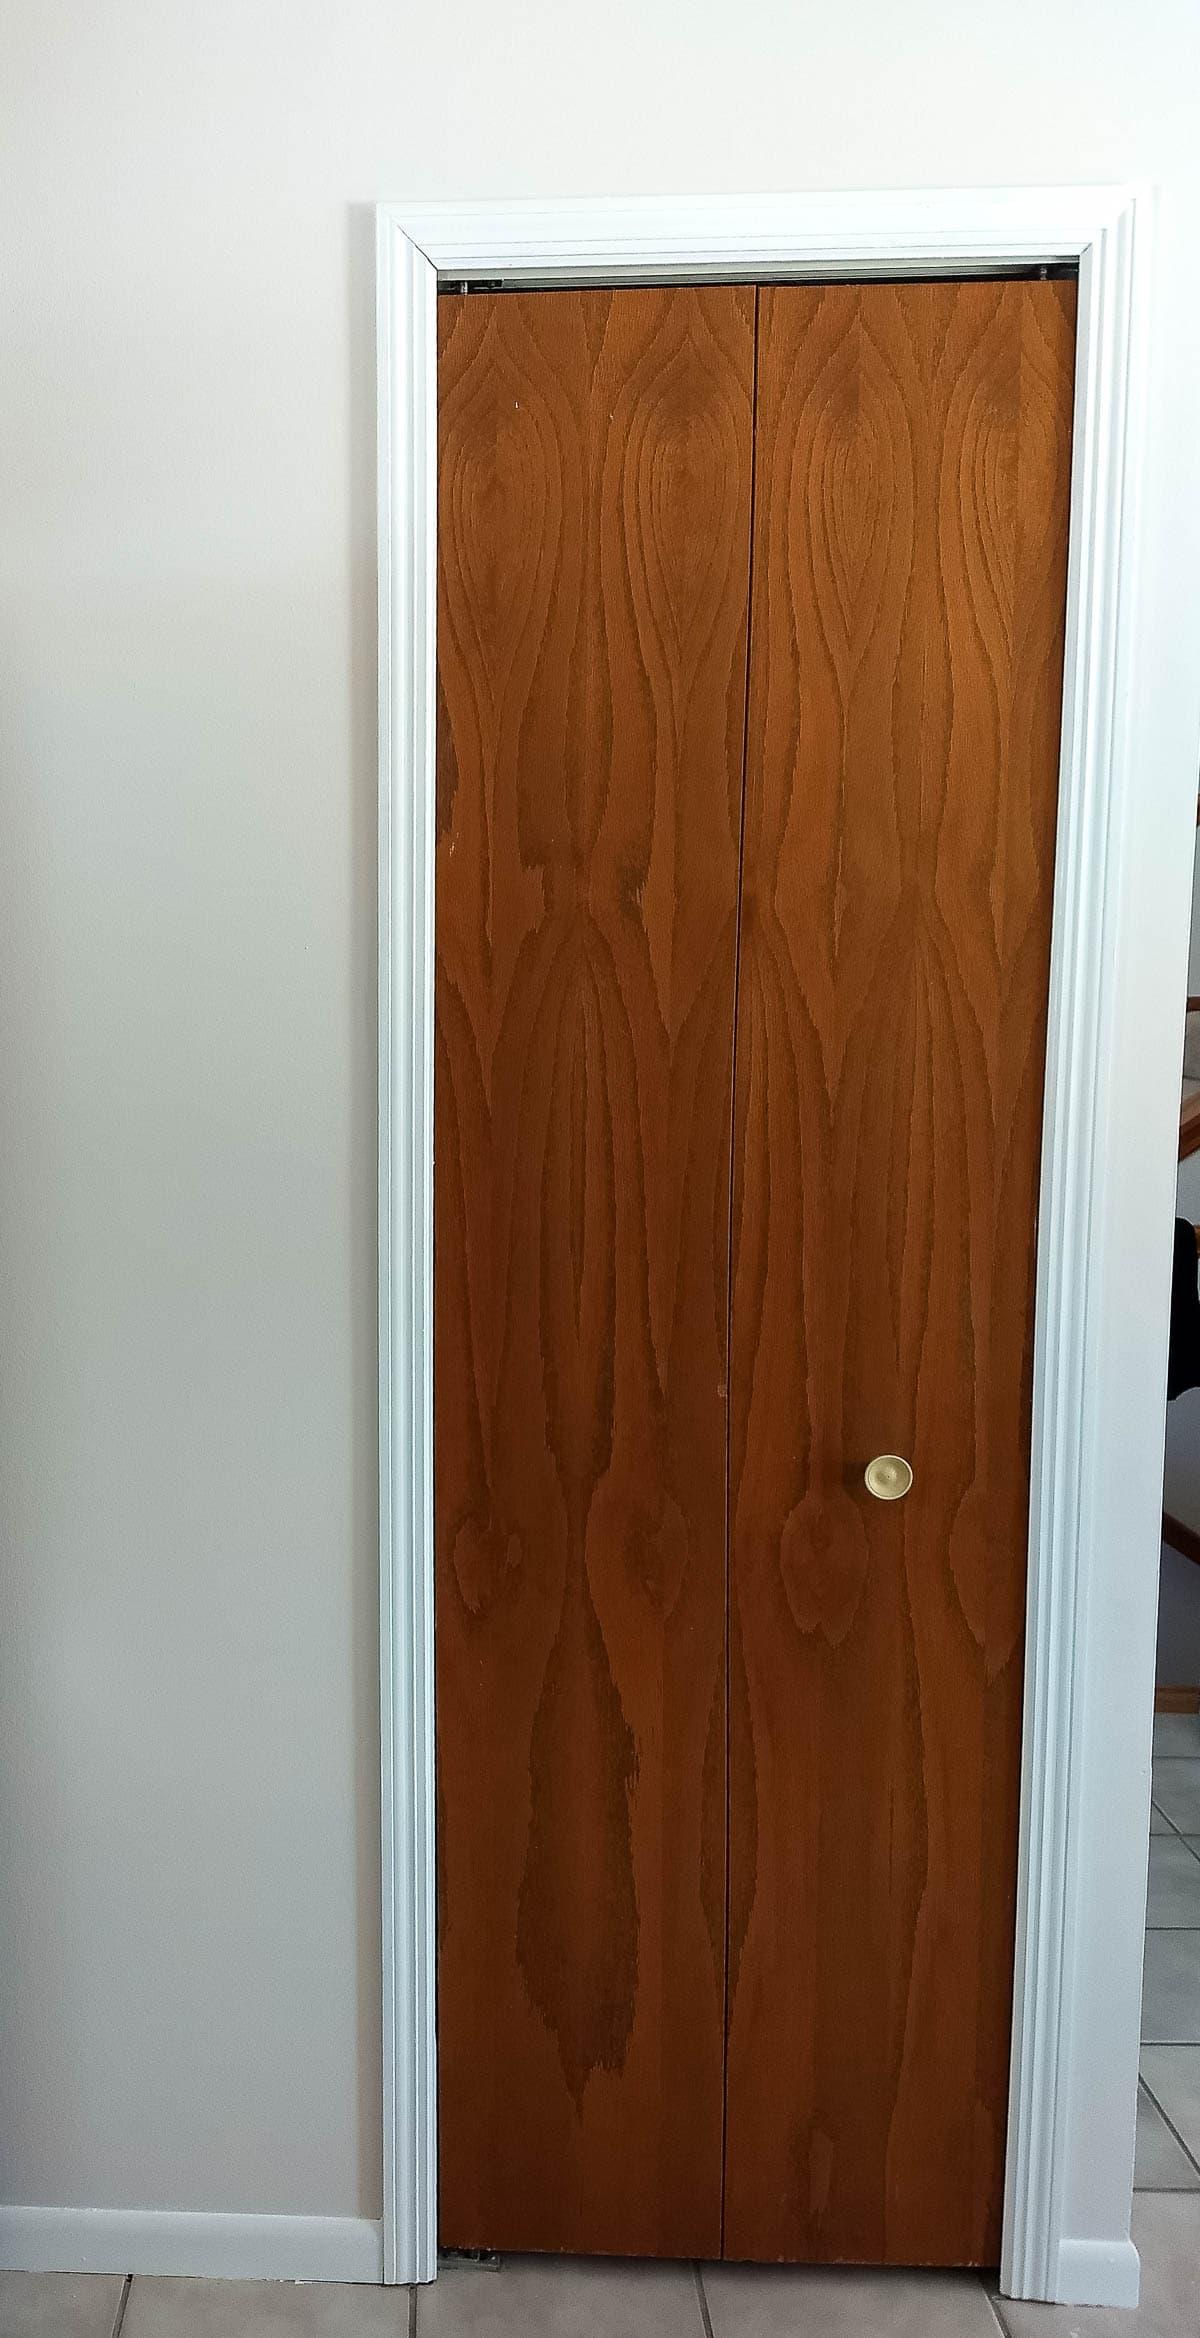 An old pantry door before updating.